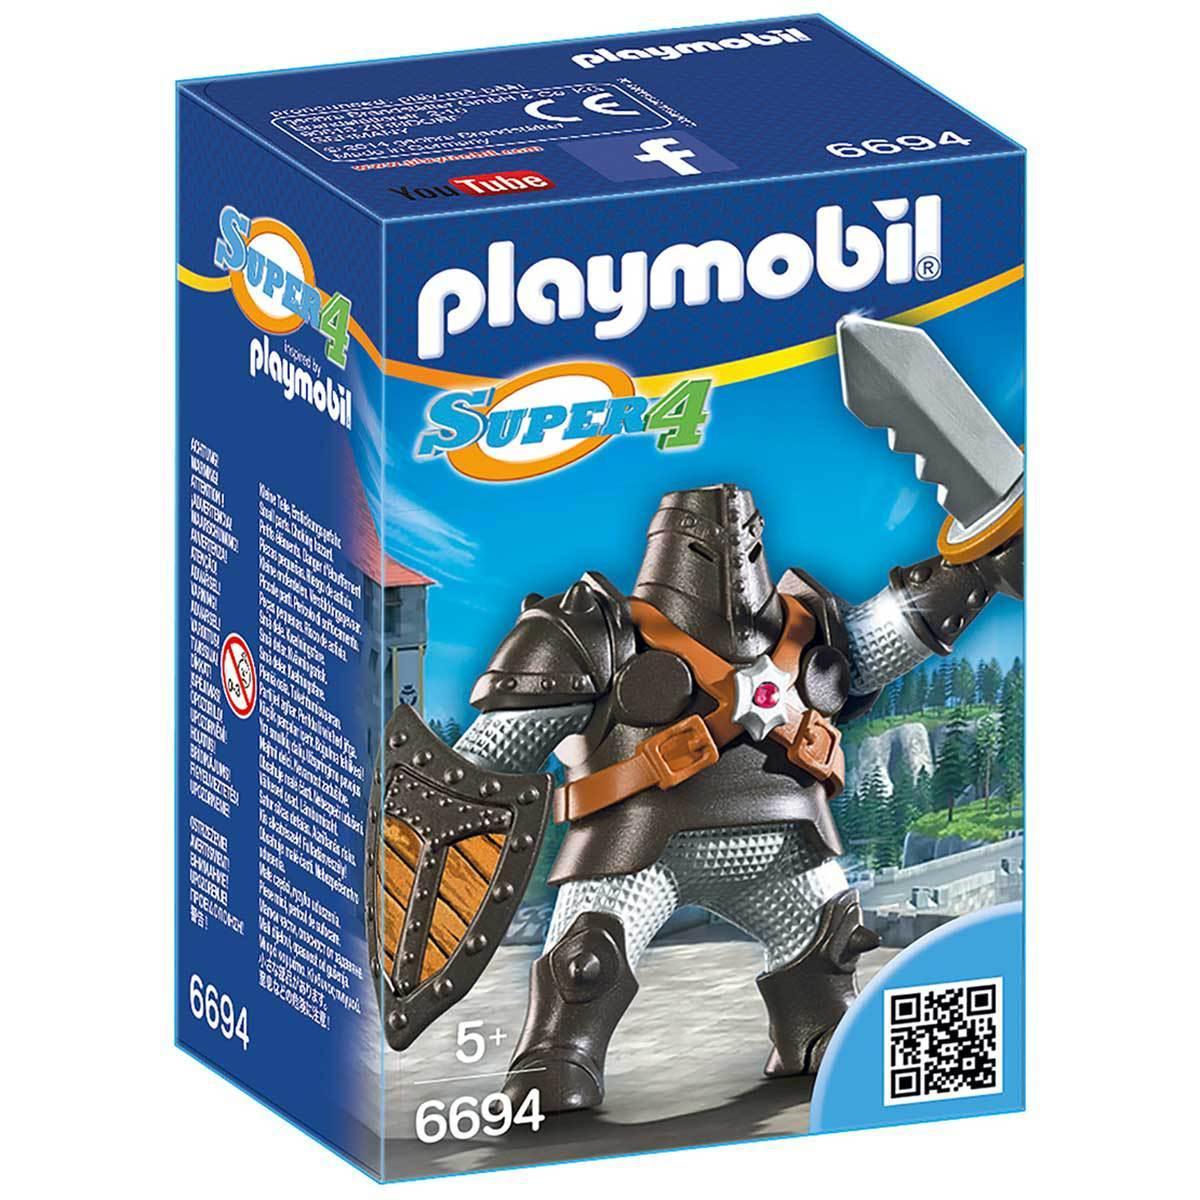 [Premium] Playmobil A1505520 - Colosse - Super4